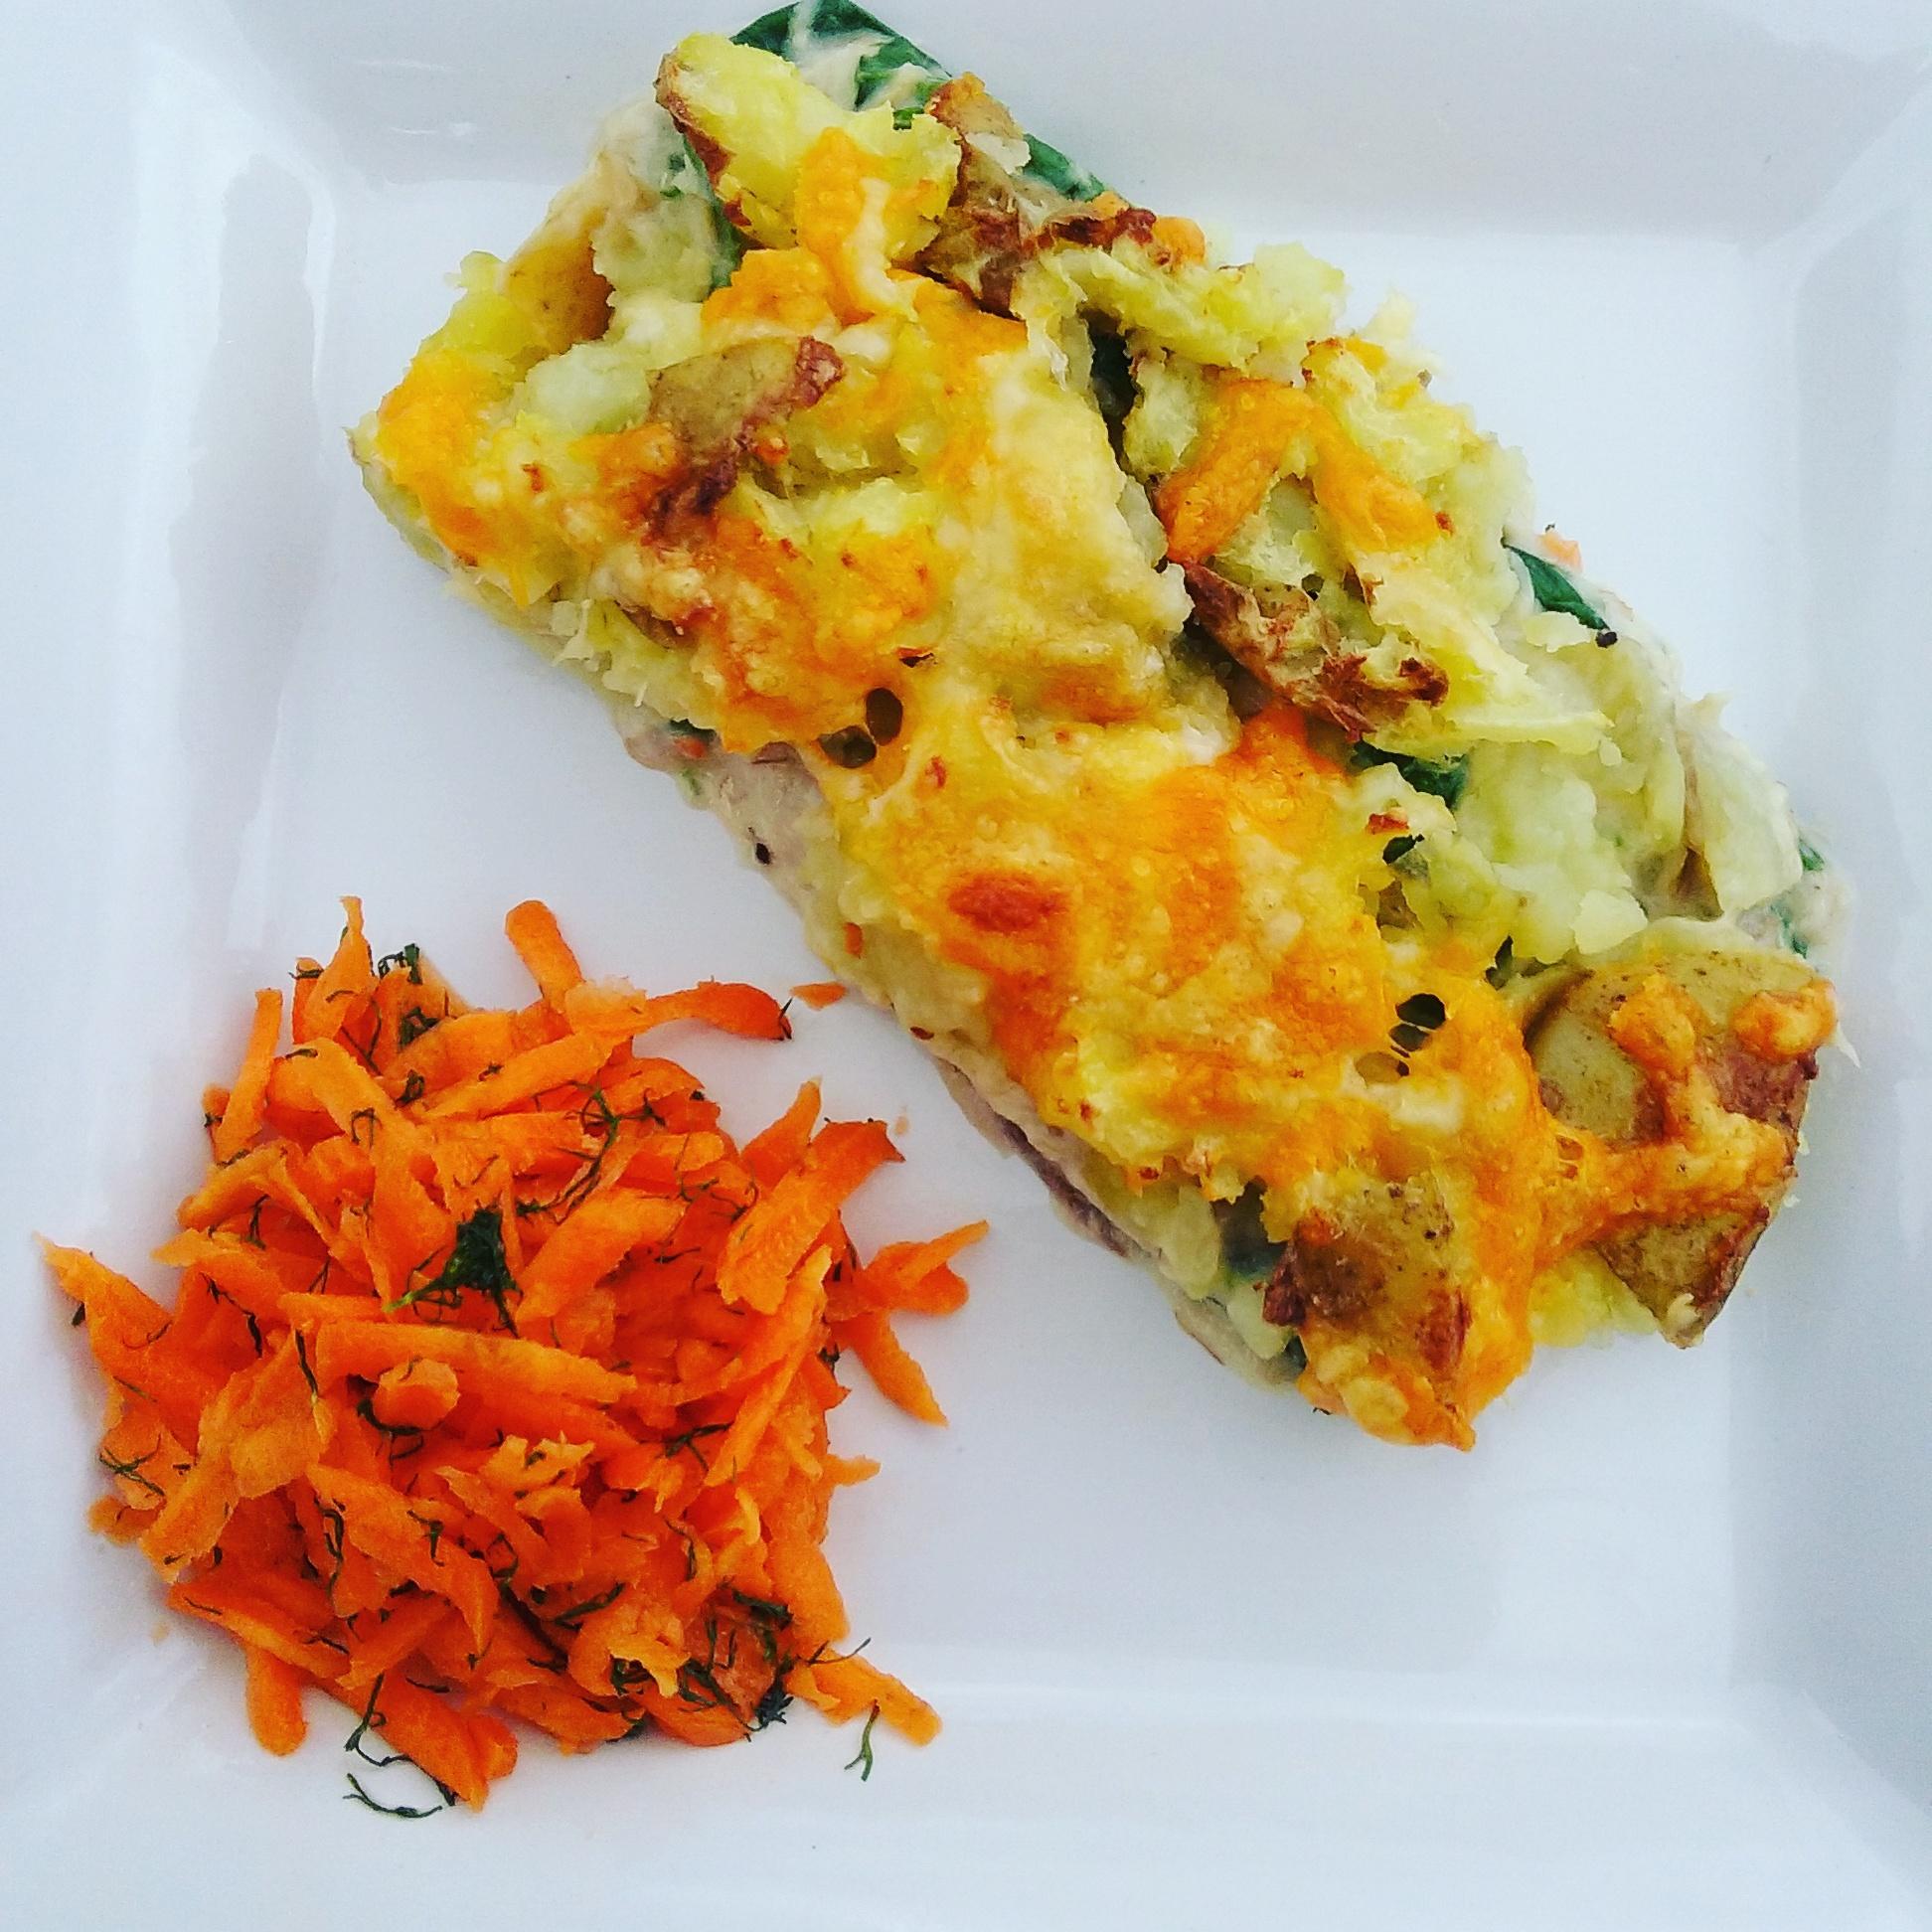 mackerel and spinach pie